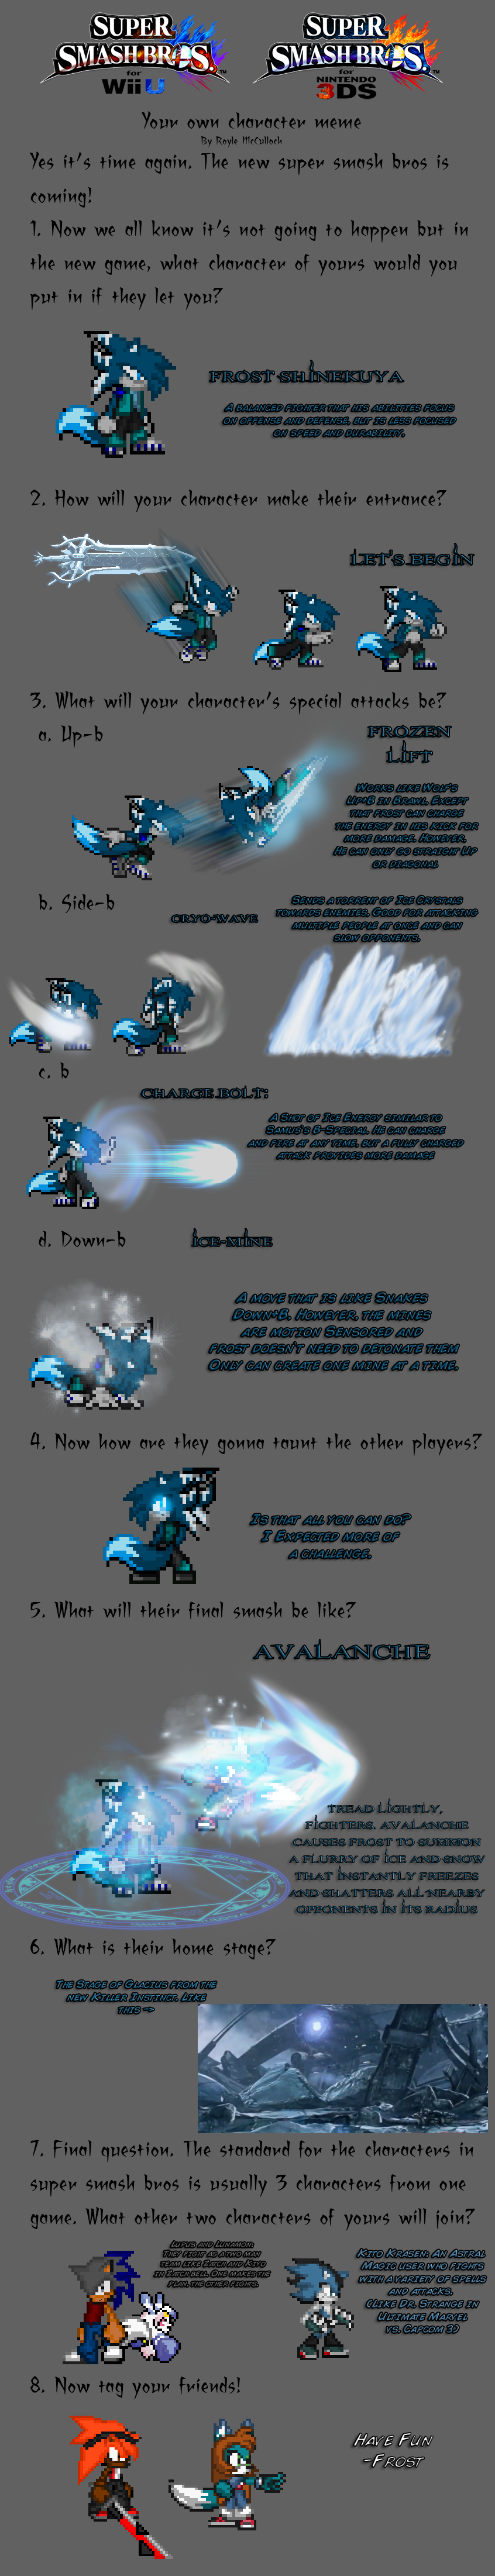 Super Smash Bro's Meme Frost by FrostRaven32